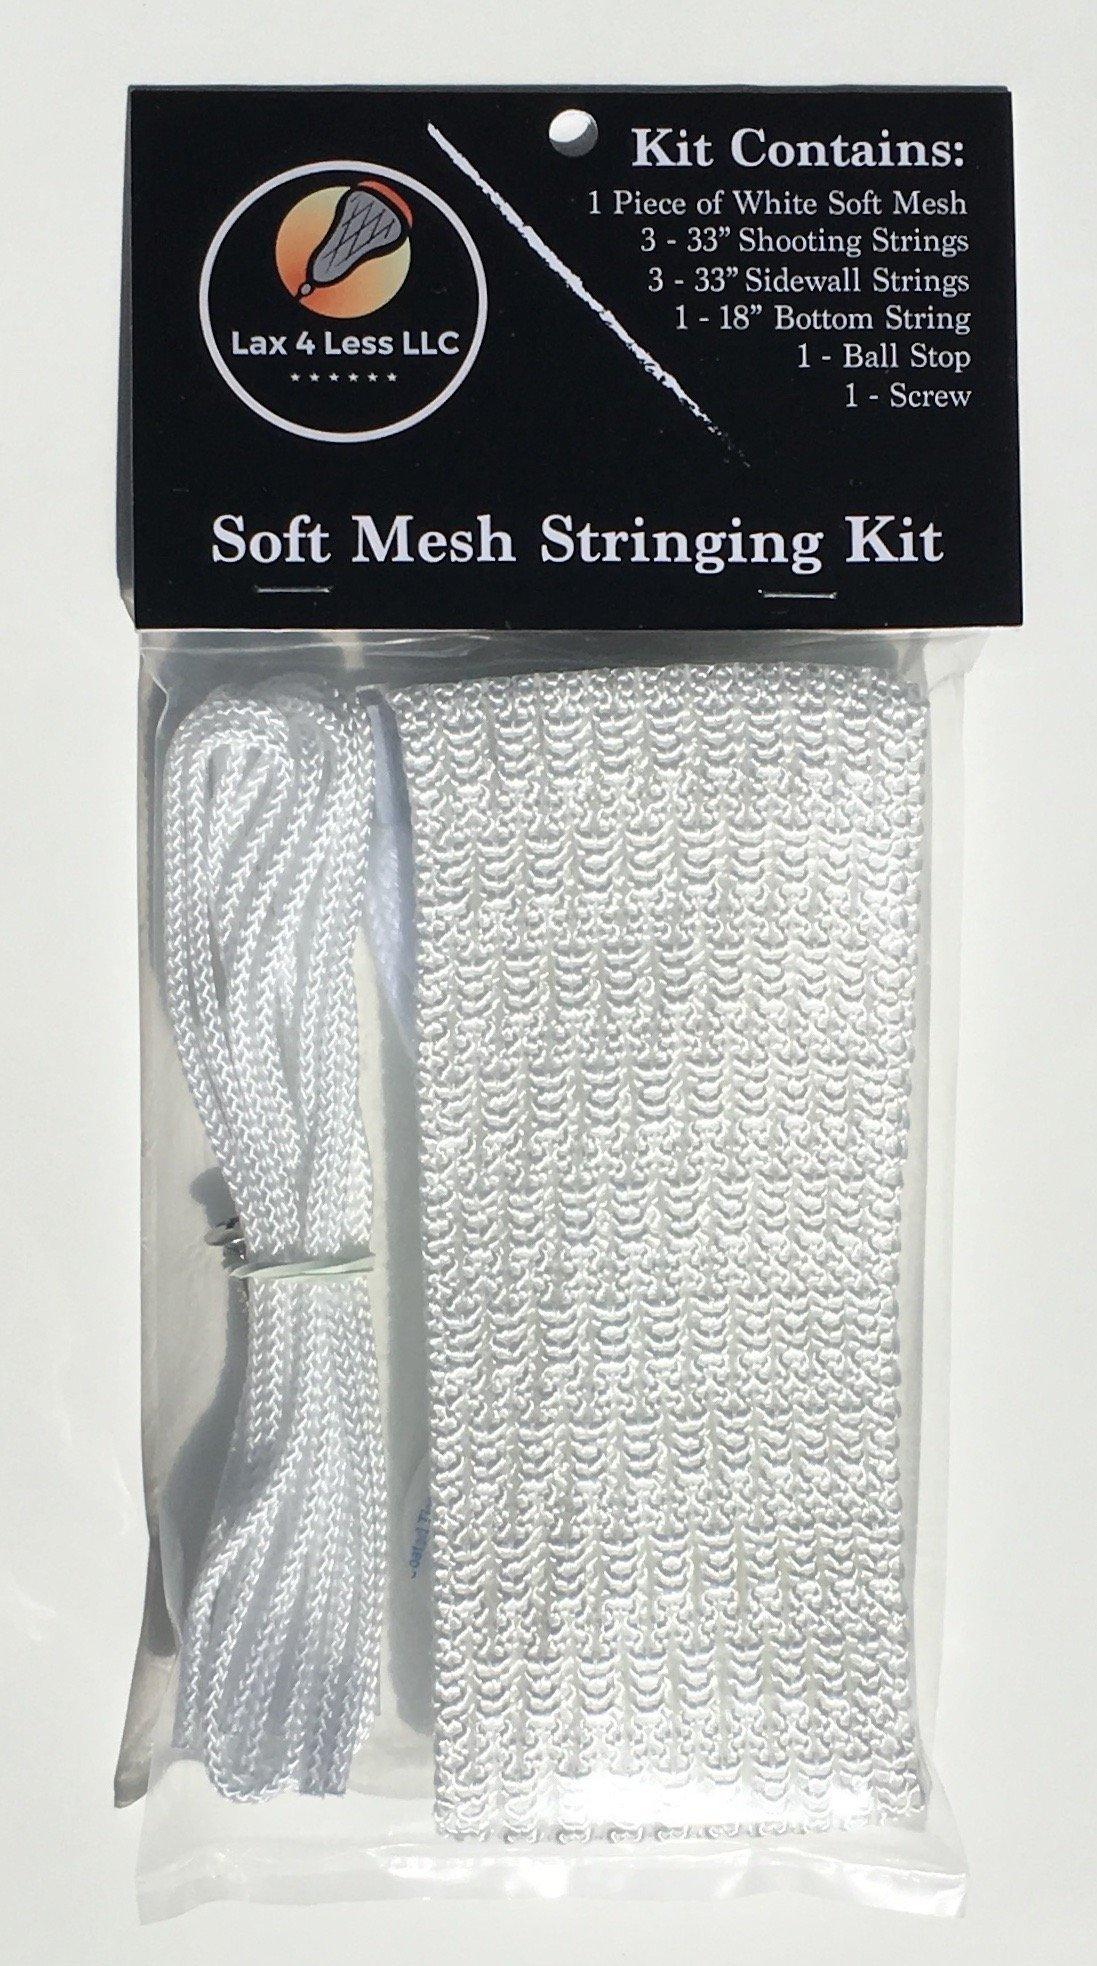 Lax 4 Less Soft Mesh Stringing Kit